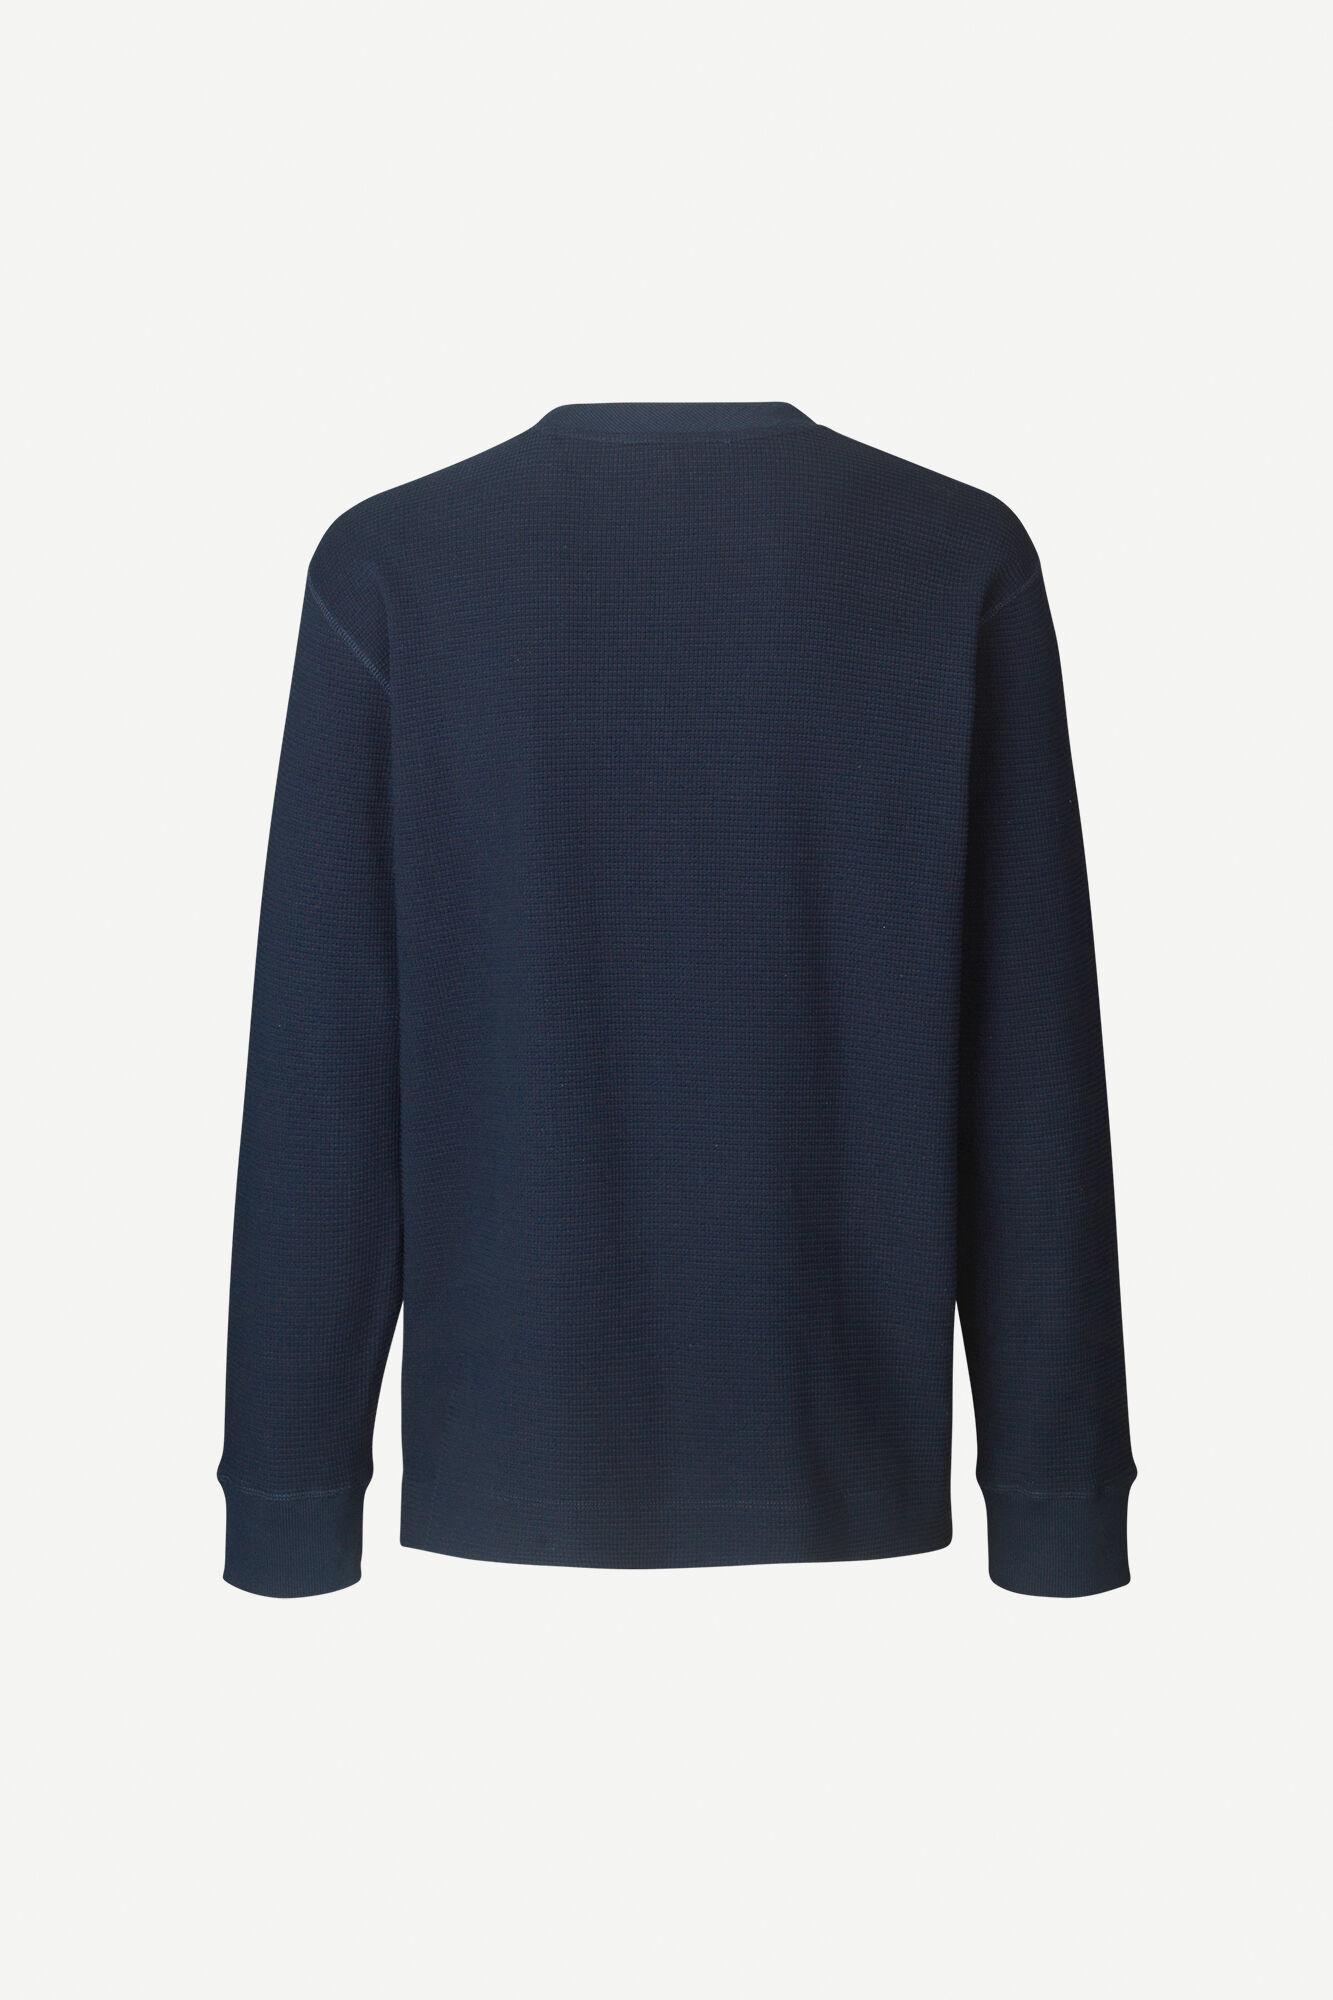 Adhil Box Fit Longsleeve T-Shirt Sky Blue 11696-2